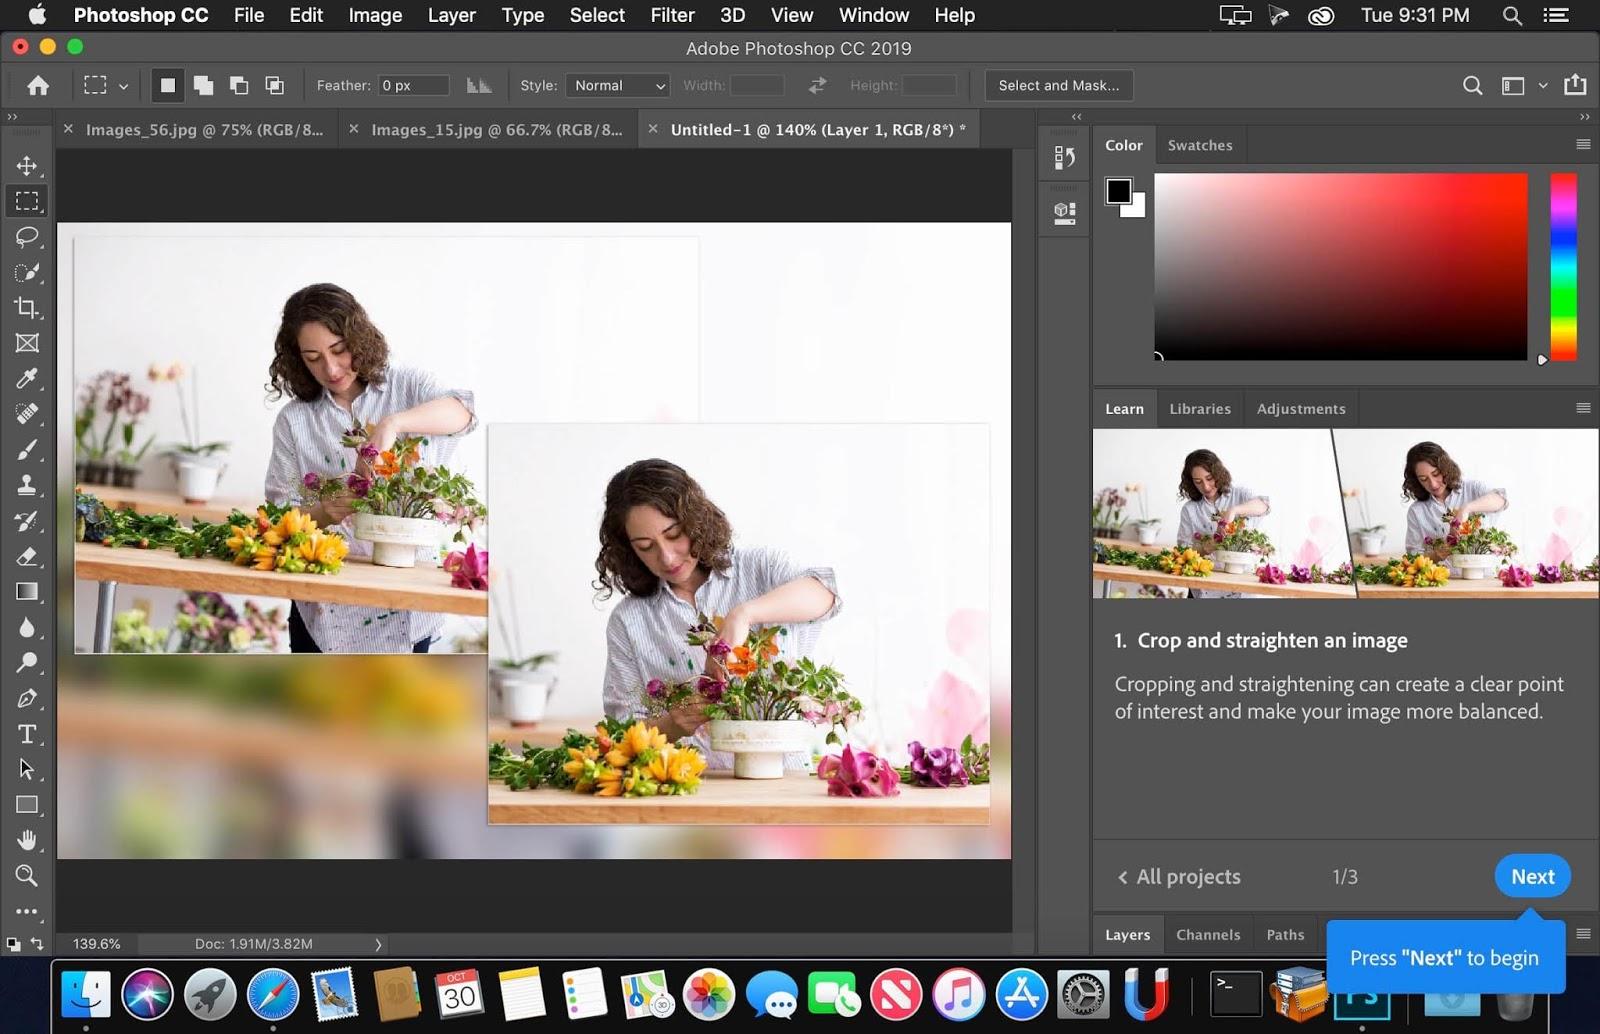 Adobe Photoshop Cc For Mac Torrent Download